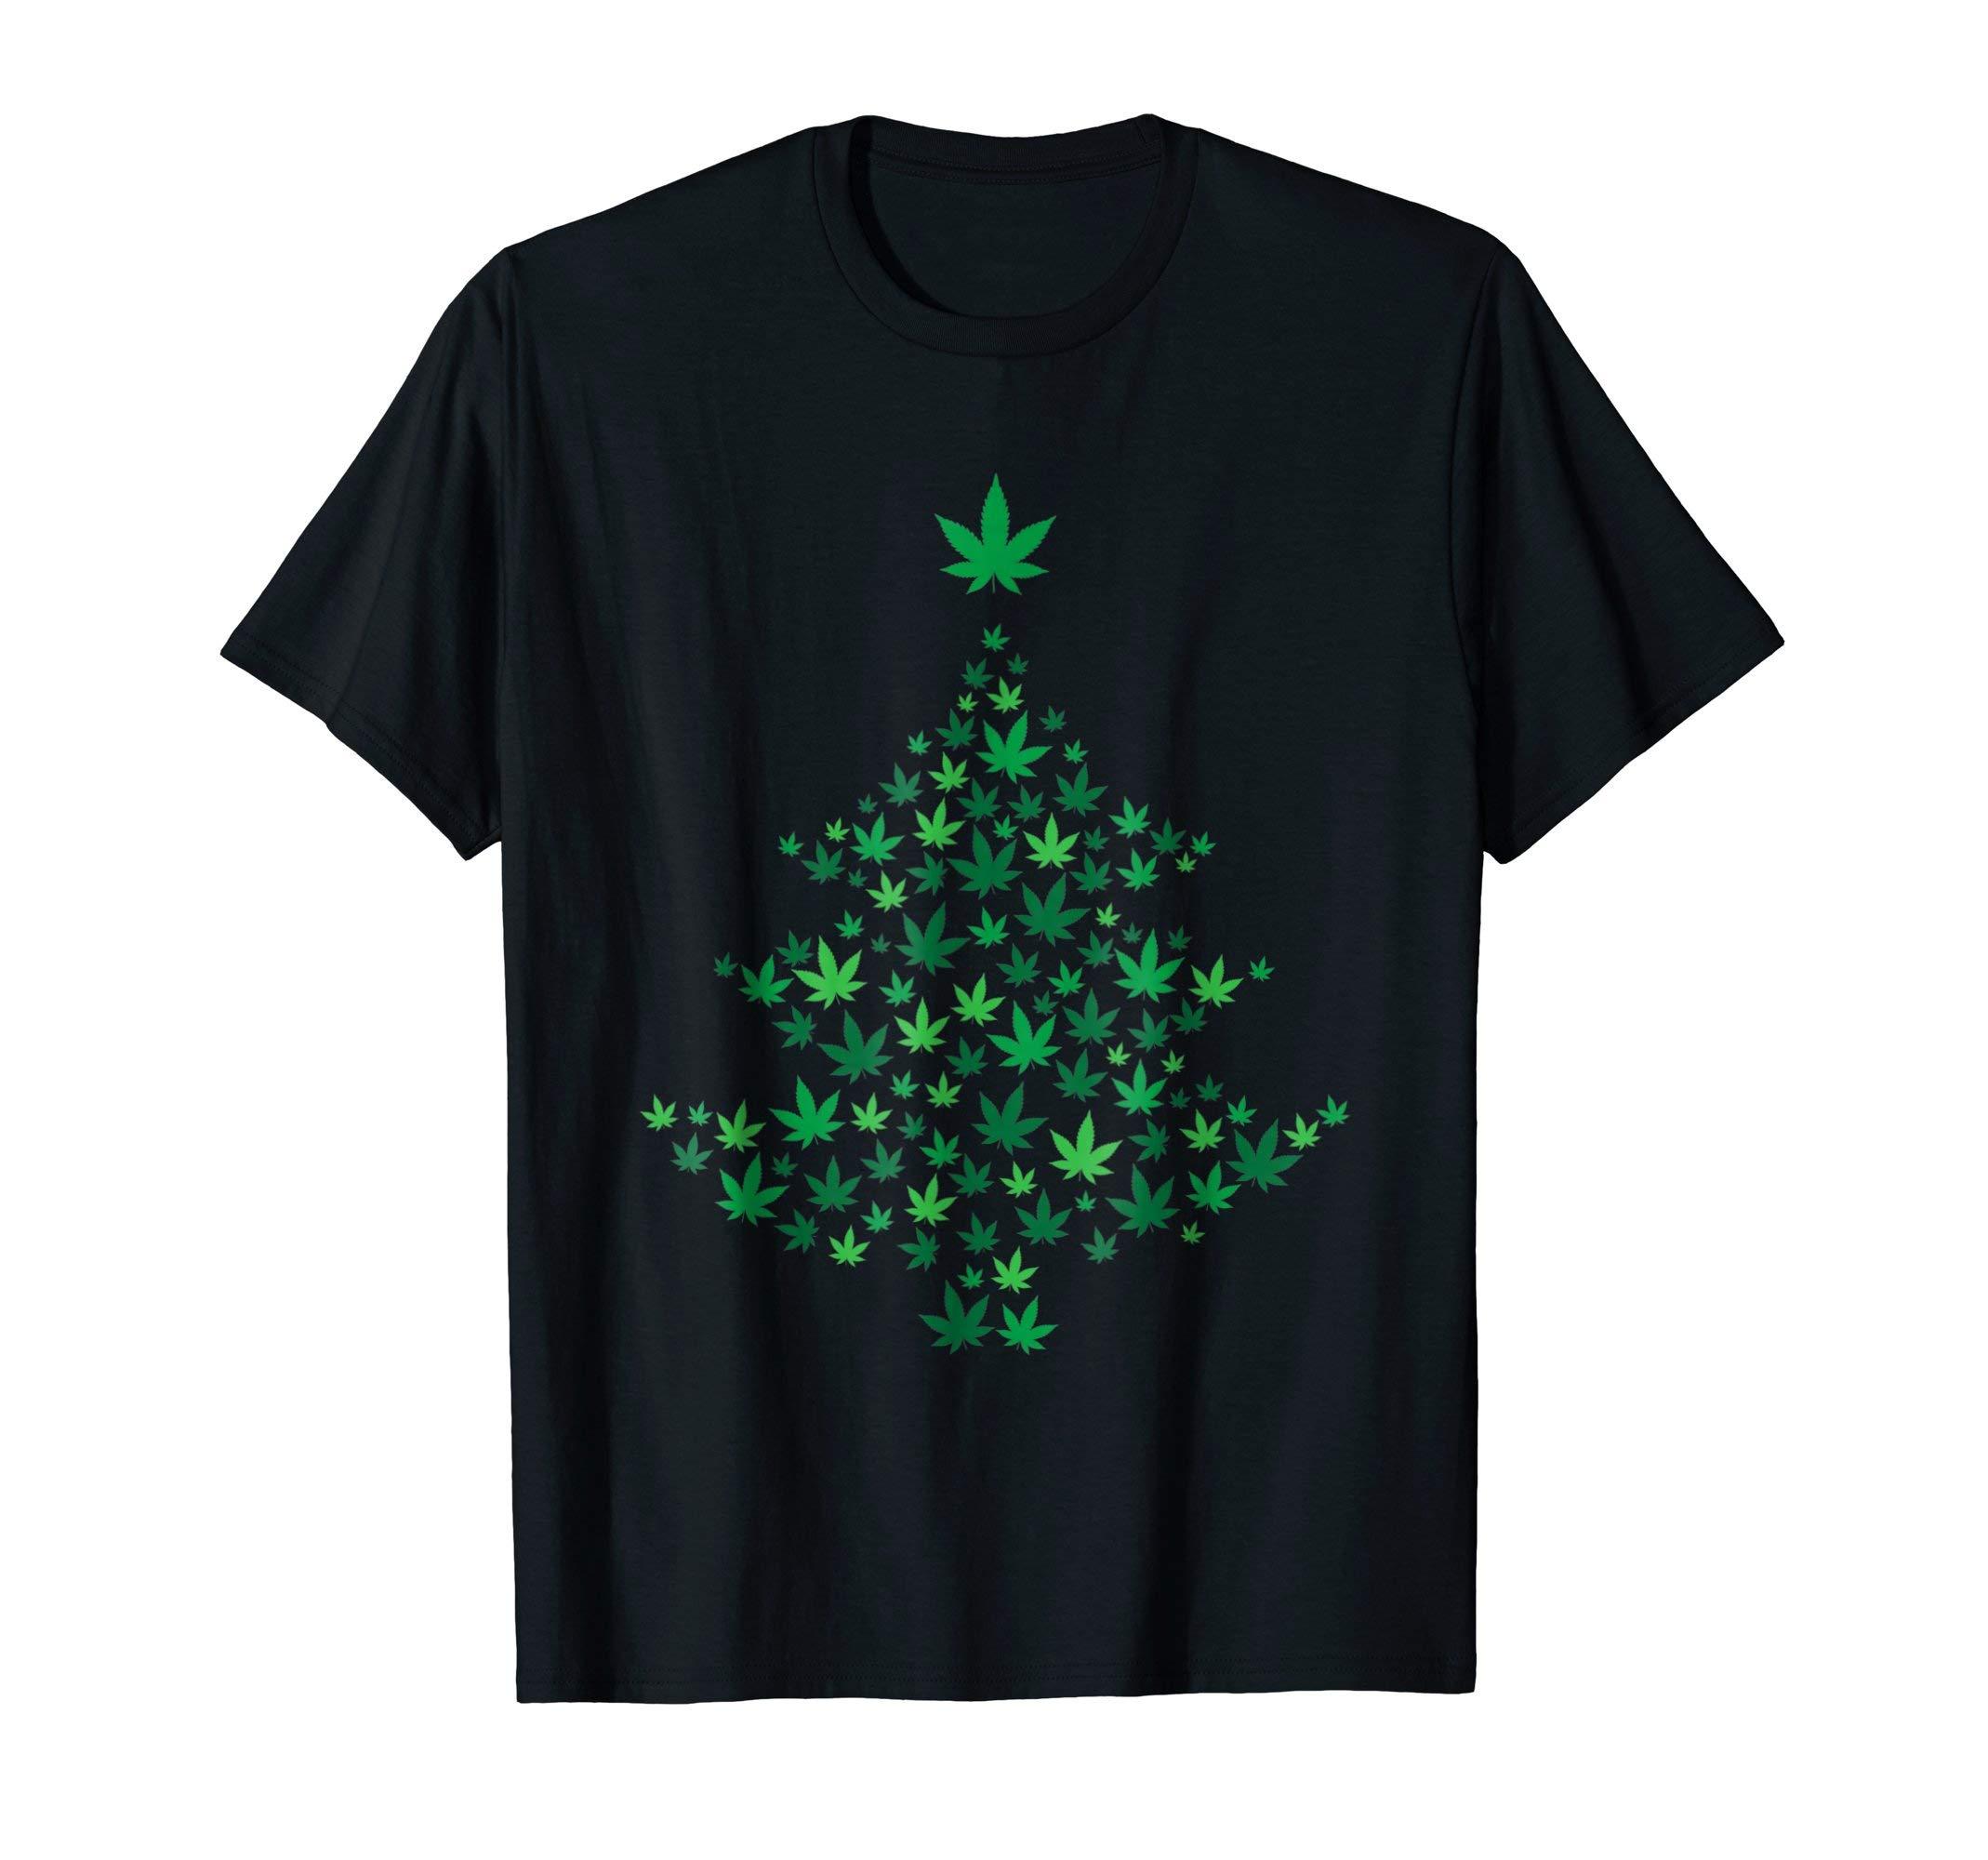 Weed Christmas Tree – Funny Marijuana Xmas Costume T-shirt